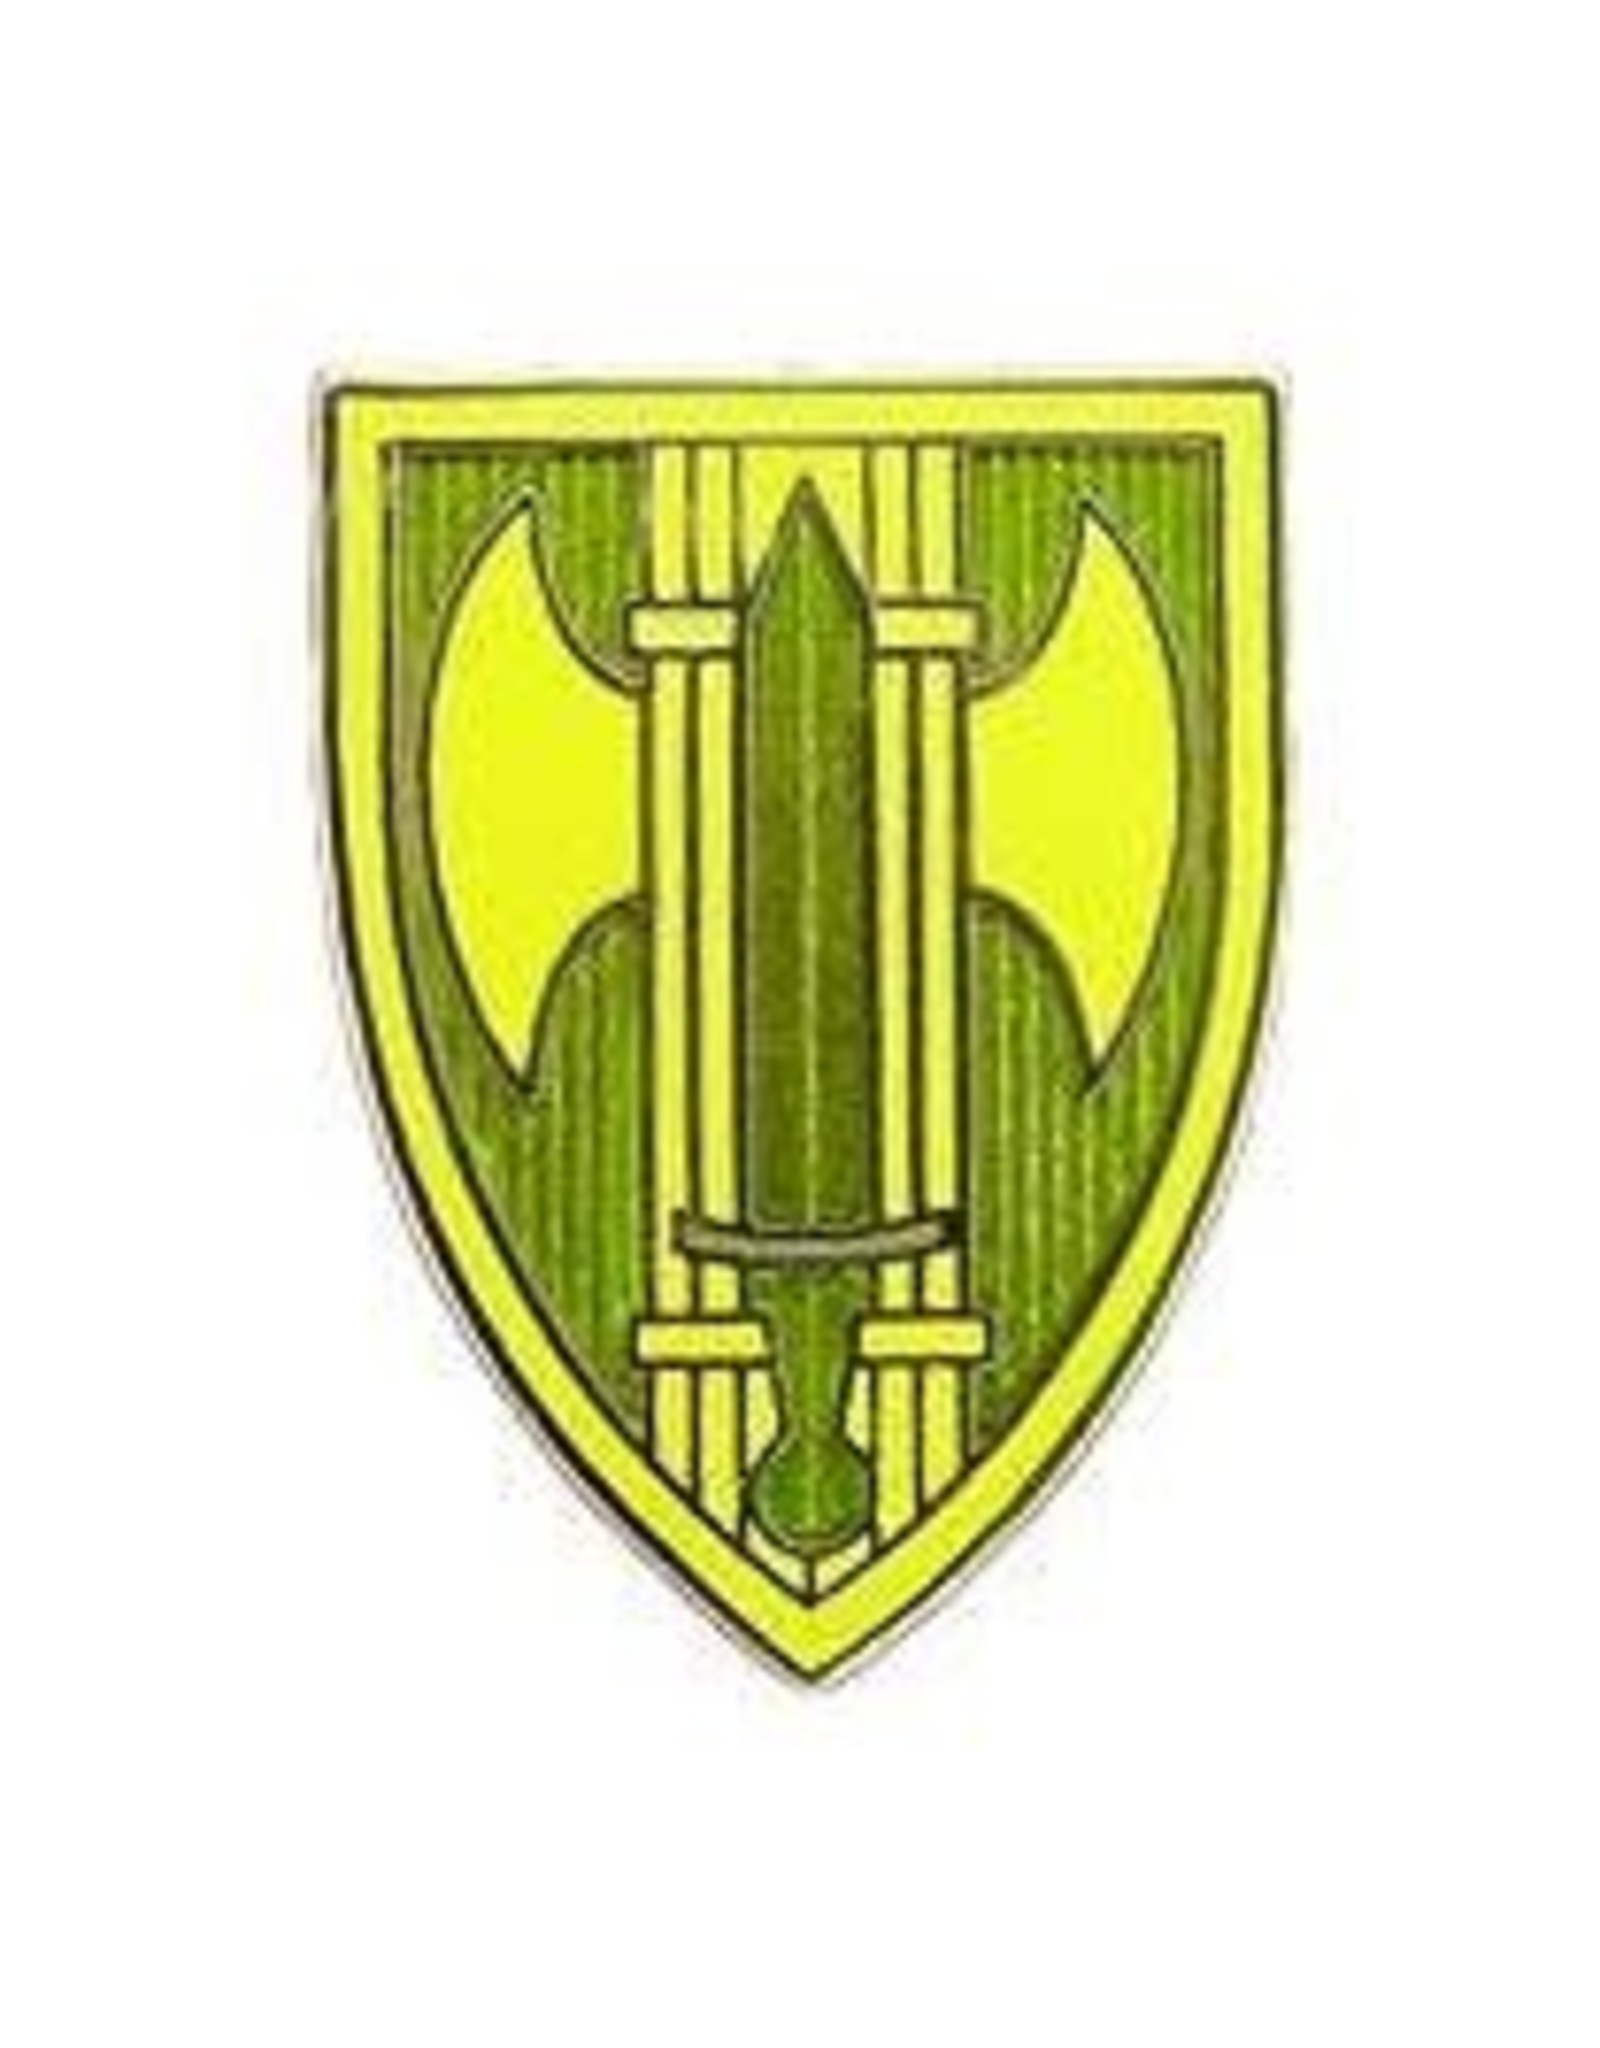 Pin - Army 018th MP Brg